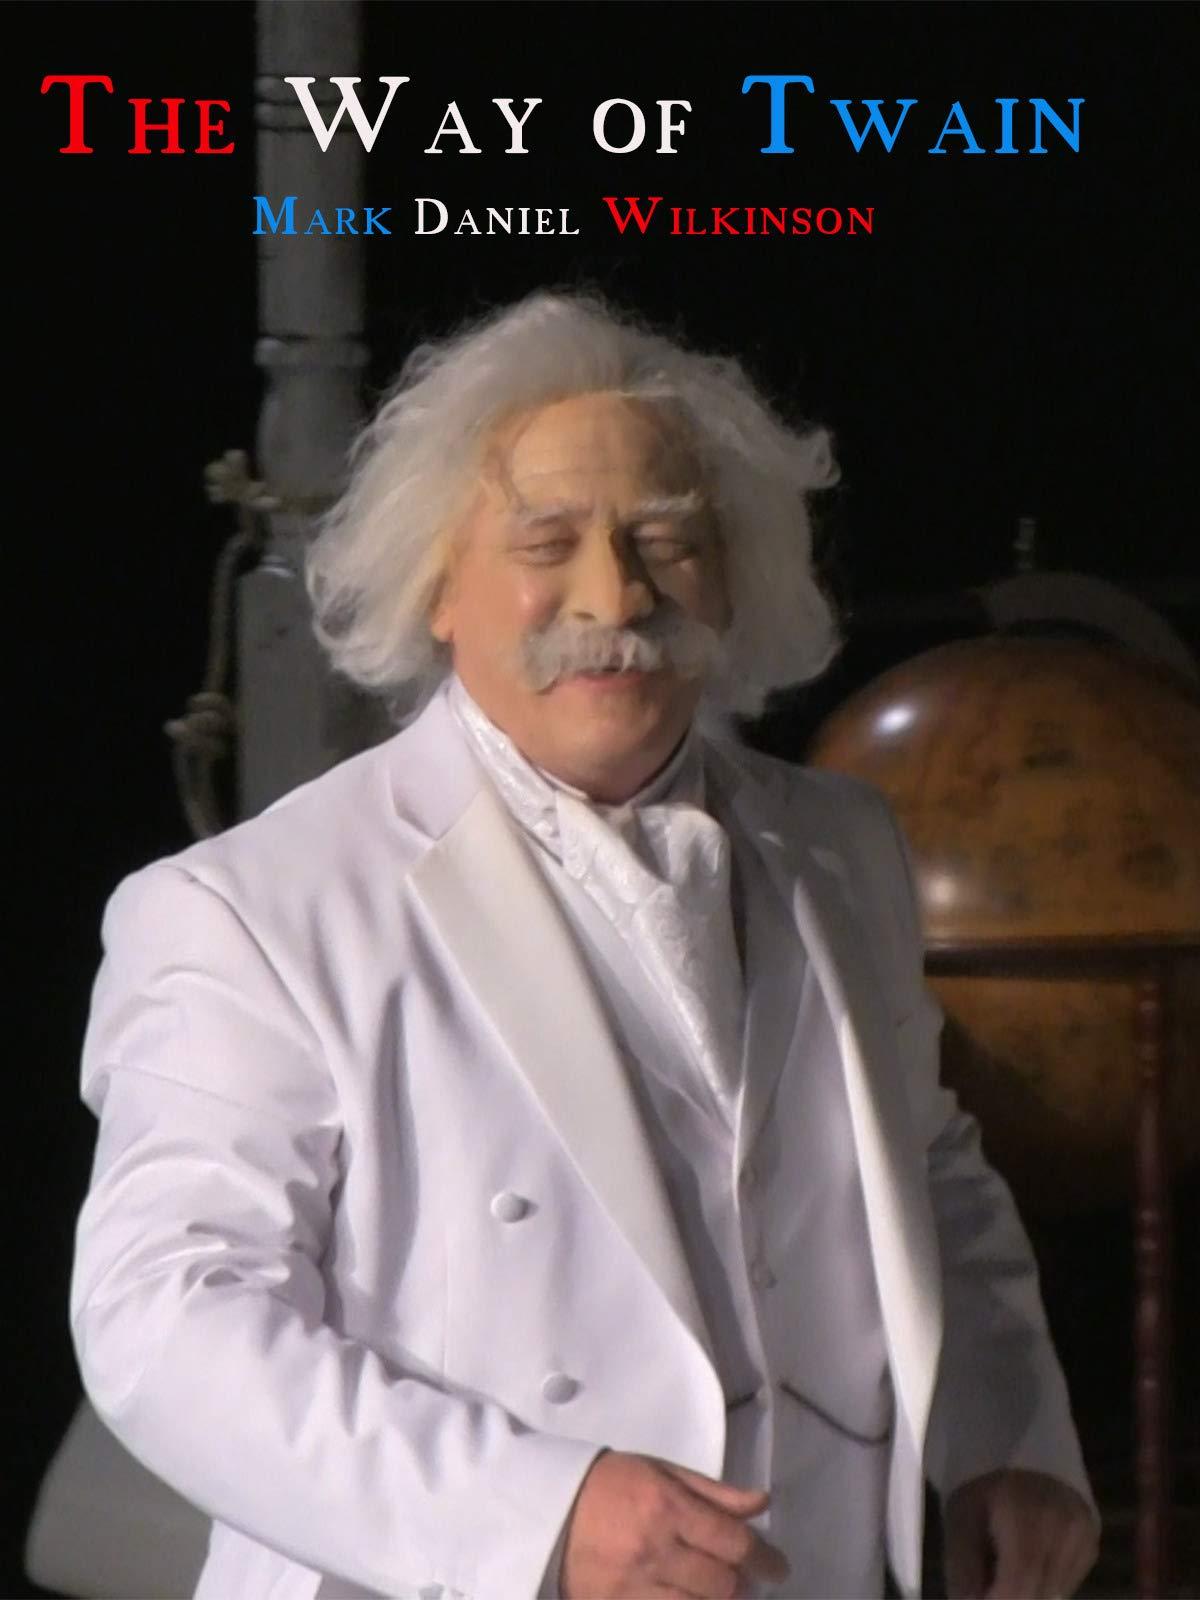 The Way of Twain